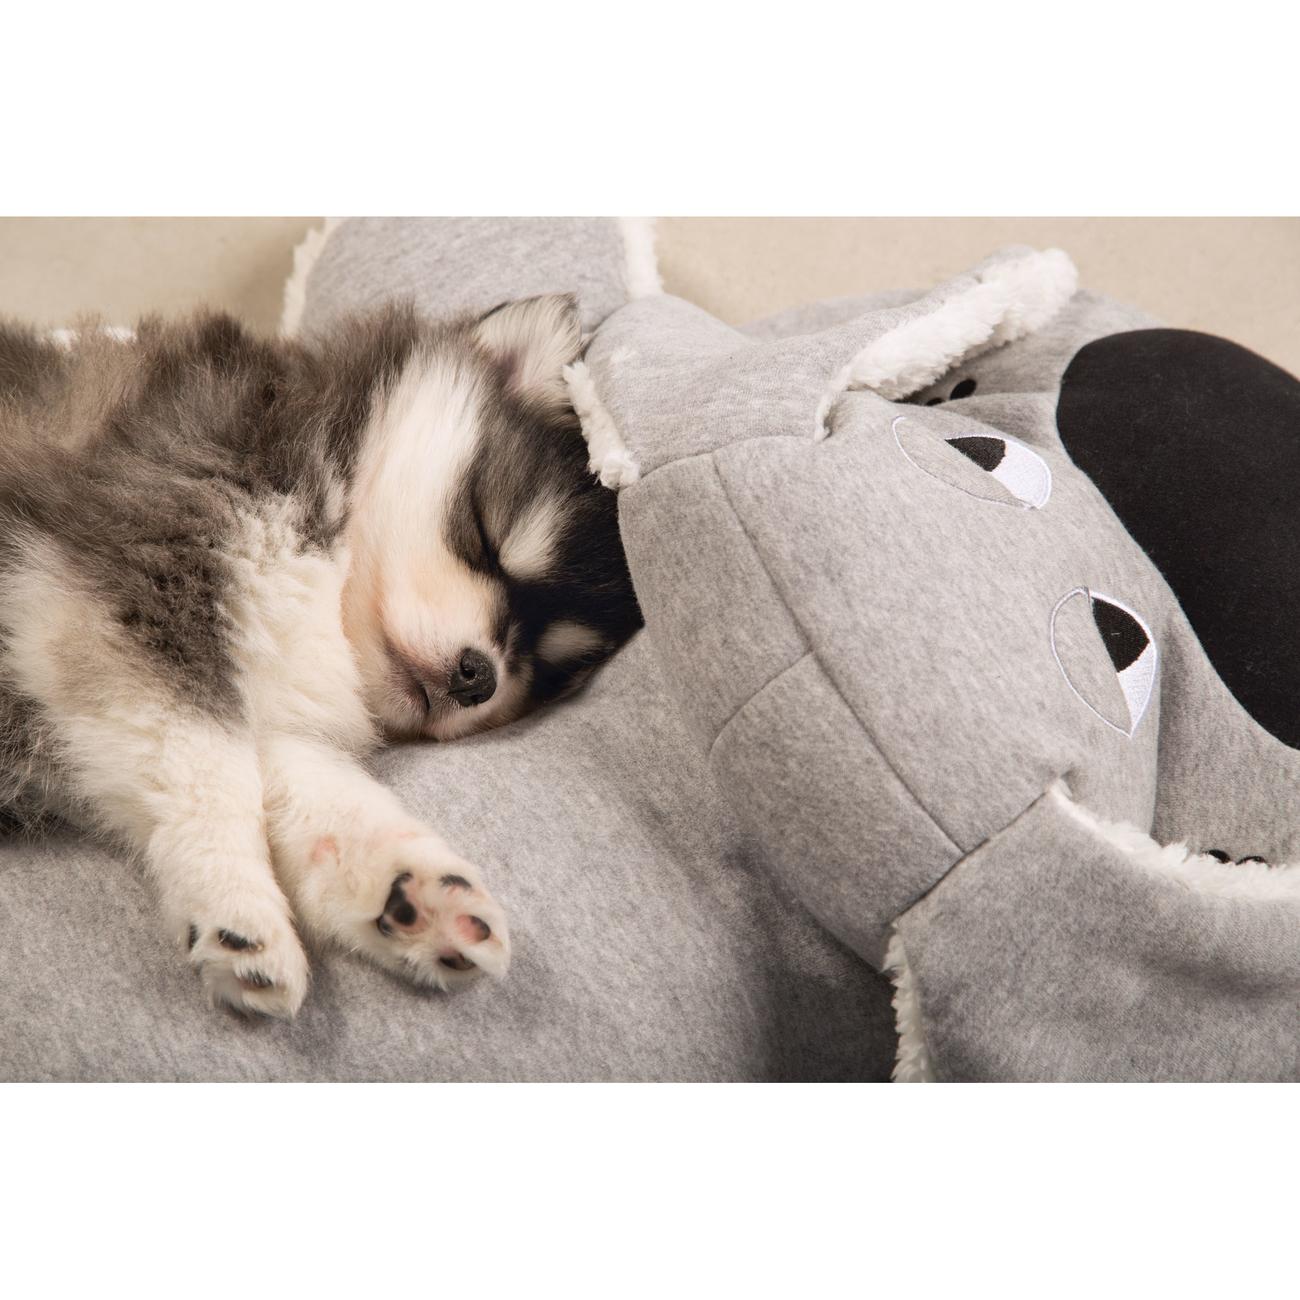 Beeztees Puppy Boomba Hundespielzeug XL, Bild 2